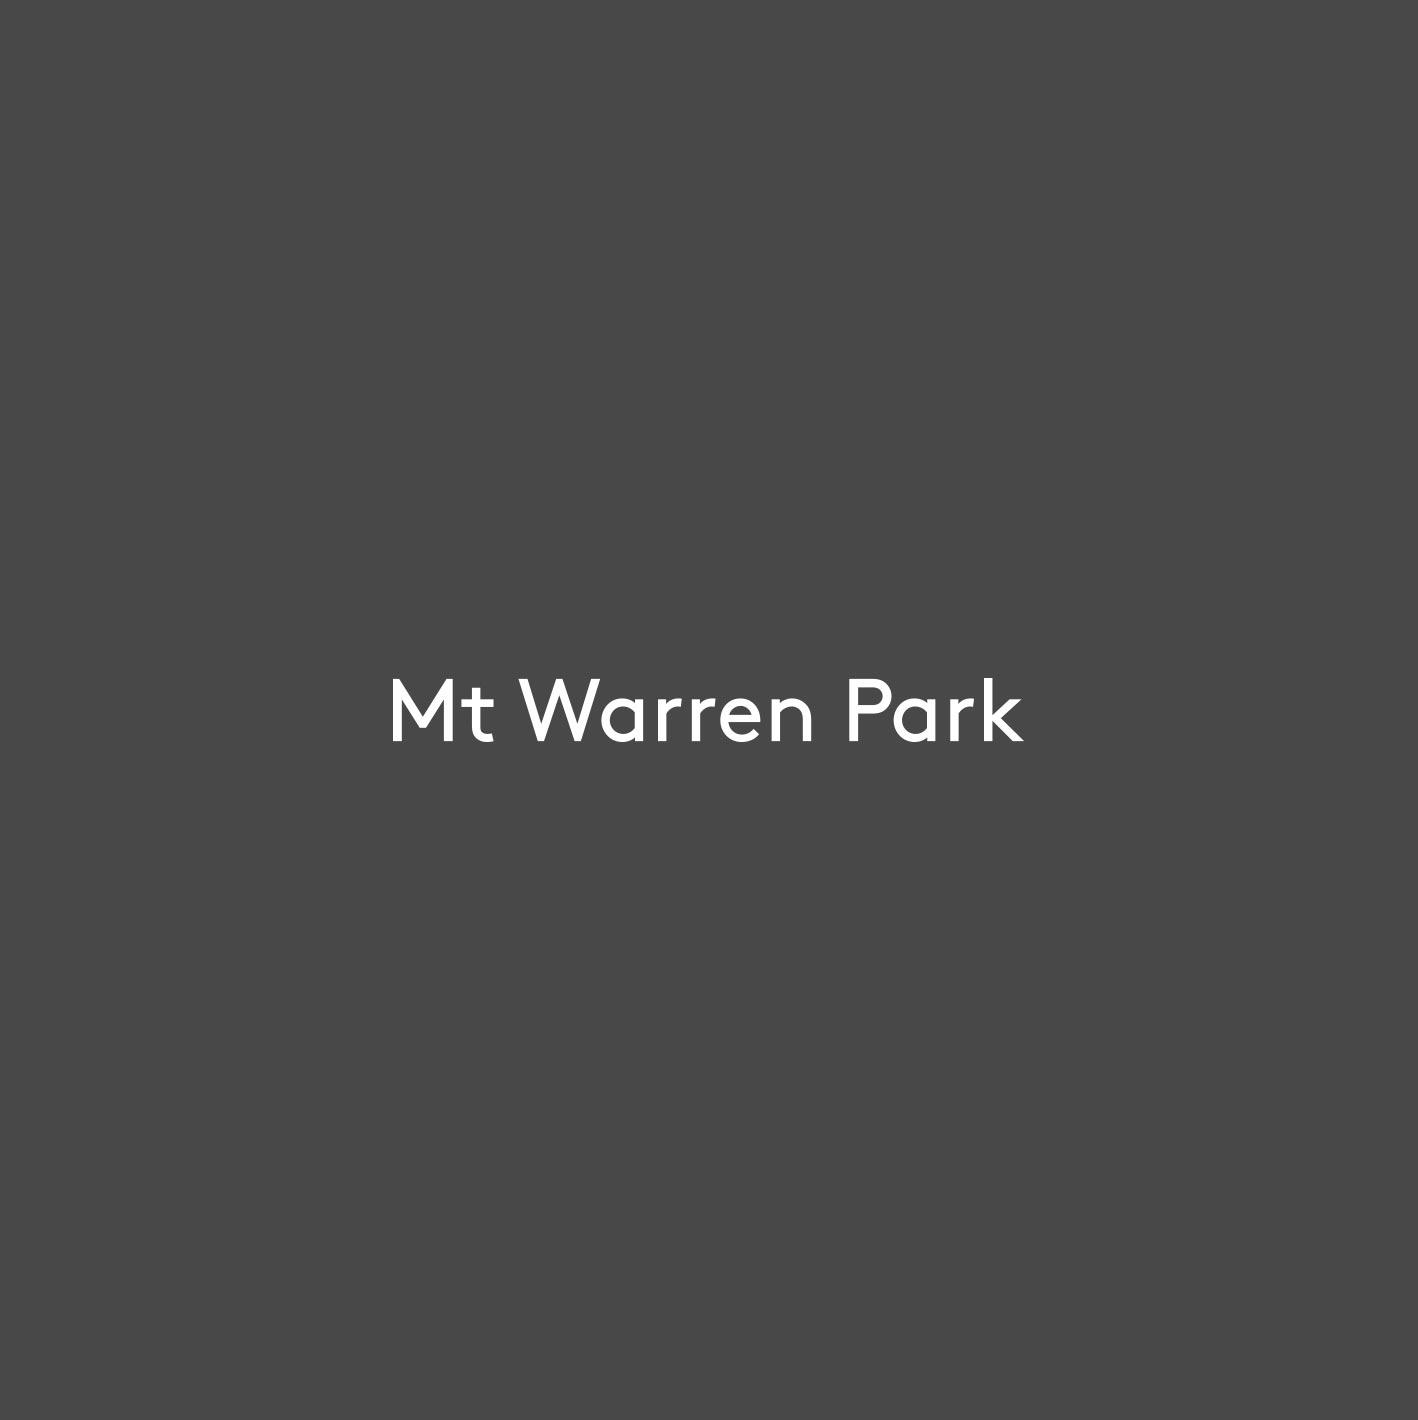 Synergy-Property-Mt-Warren-Park.jpg